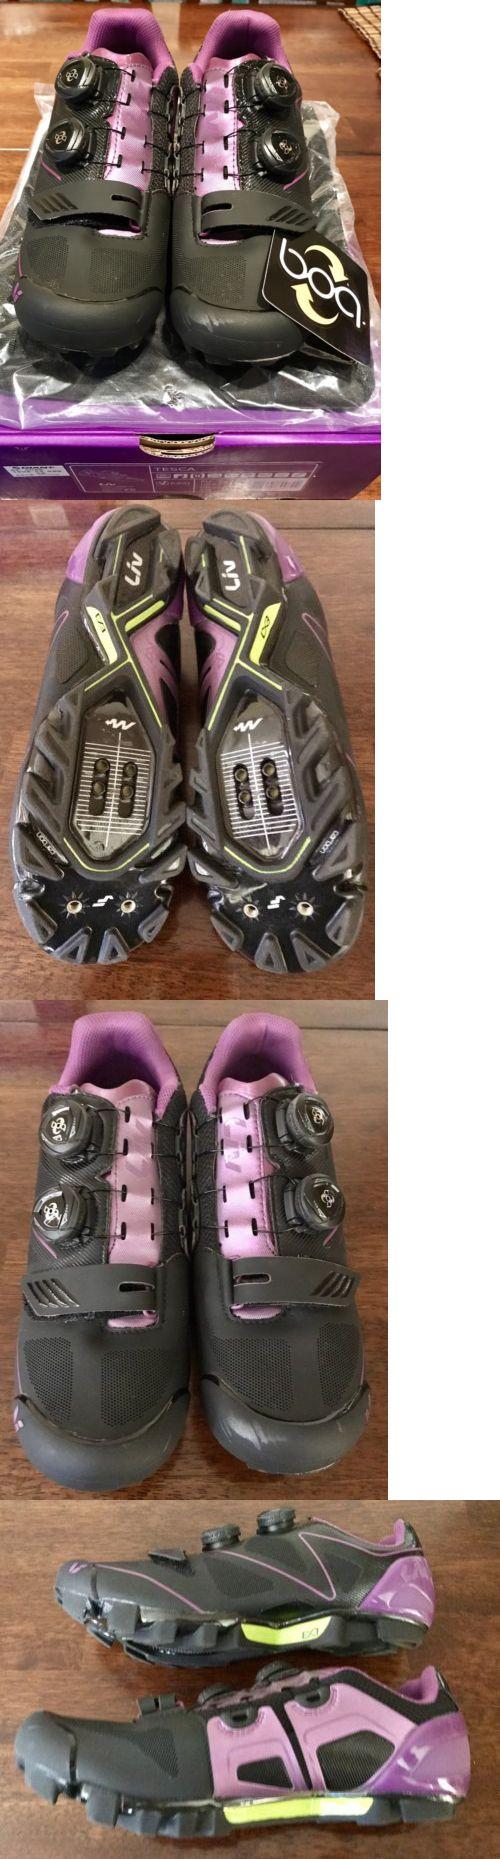 Women 158987: New Women S Liv Tesca Mtb Shoes, Carbon, Spd, Boa, Eu 41 Us 10 -> BUY IT NOW ONLY: $140 on eBay!